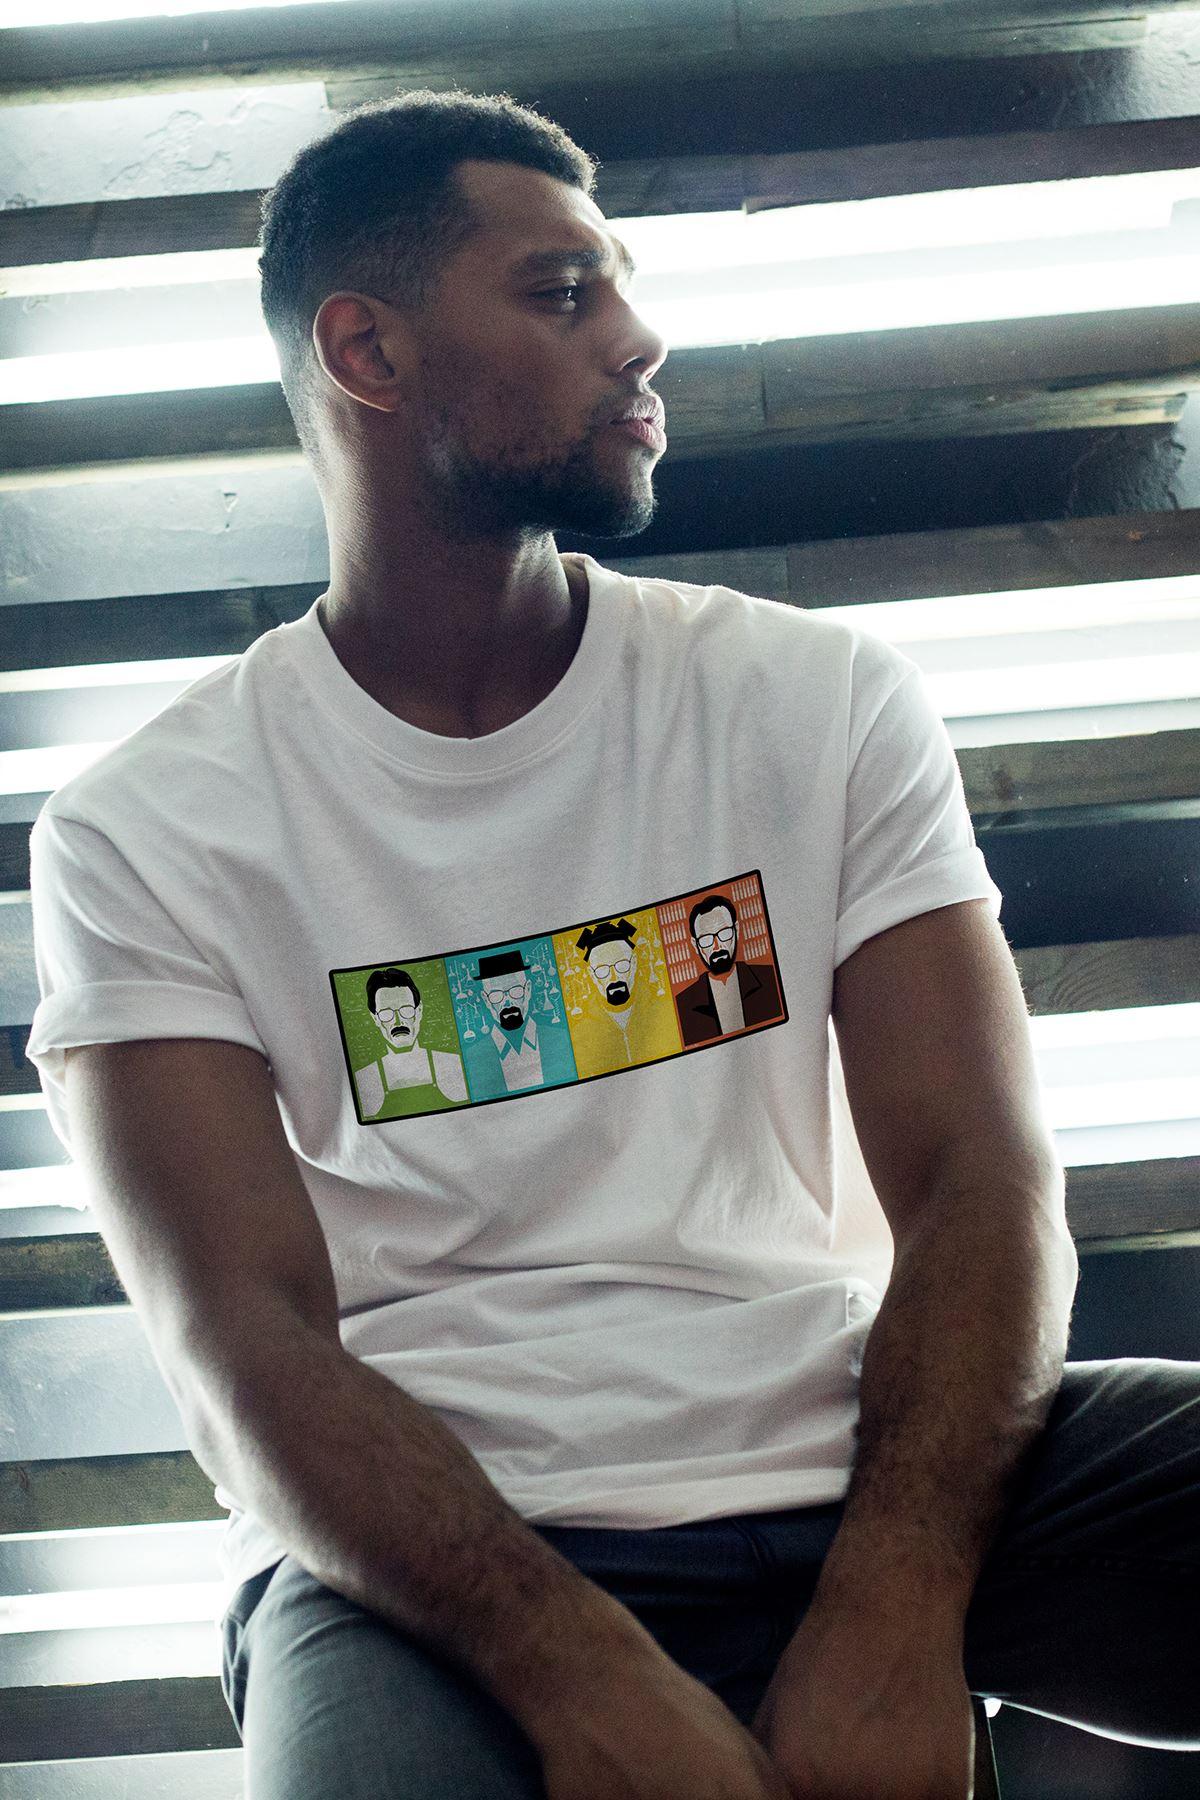 Breaking Bad Heisenberg 01 Beyaz Erkek Oversize Tshirt - Tişört